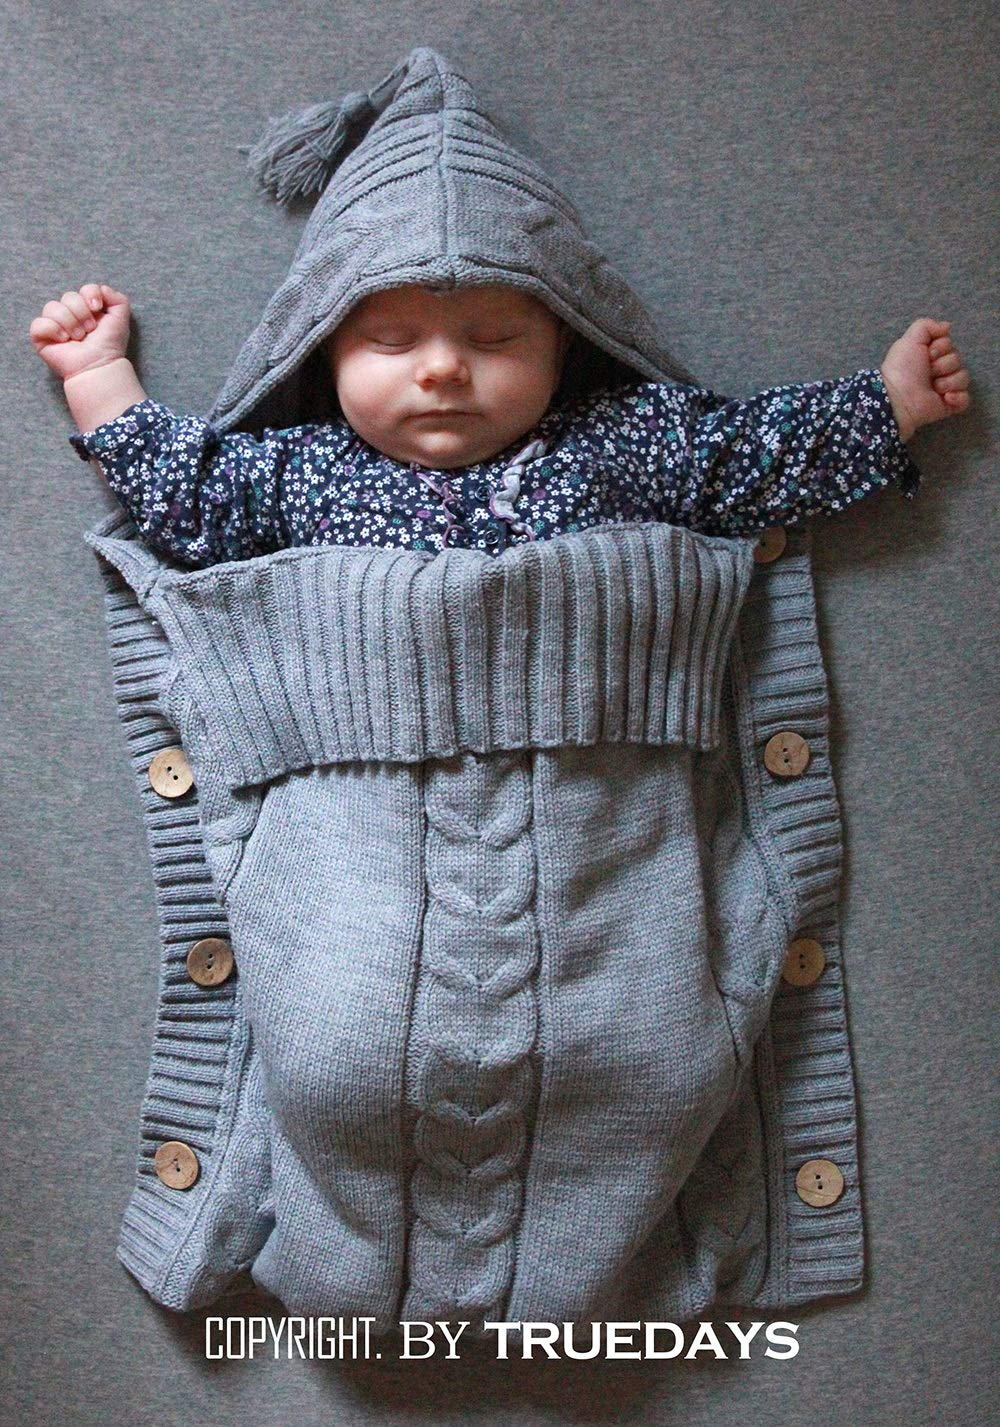 Newborn Baby Swaddle Blanket-Truedays Large Swaddle Best Soft for Boys or Girls Grey